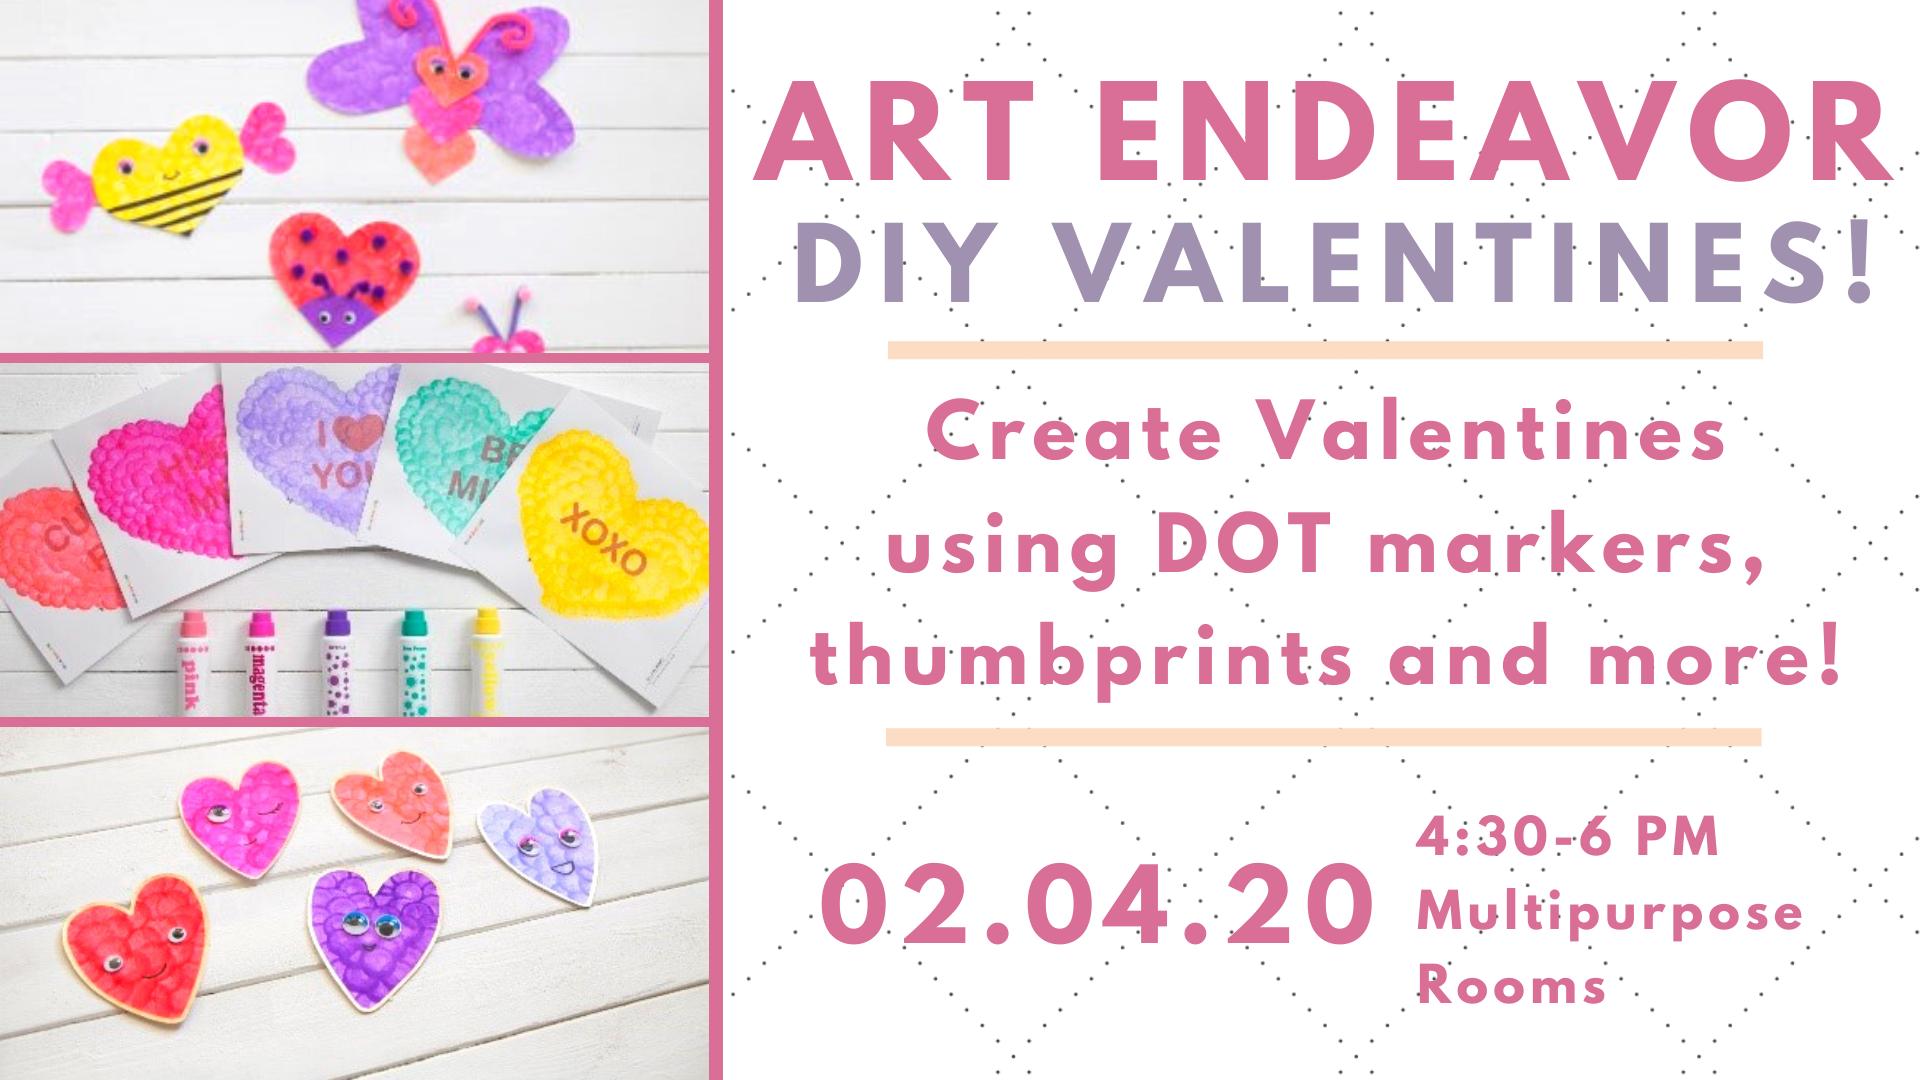 Art Endeavor: DIY Valentines!